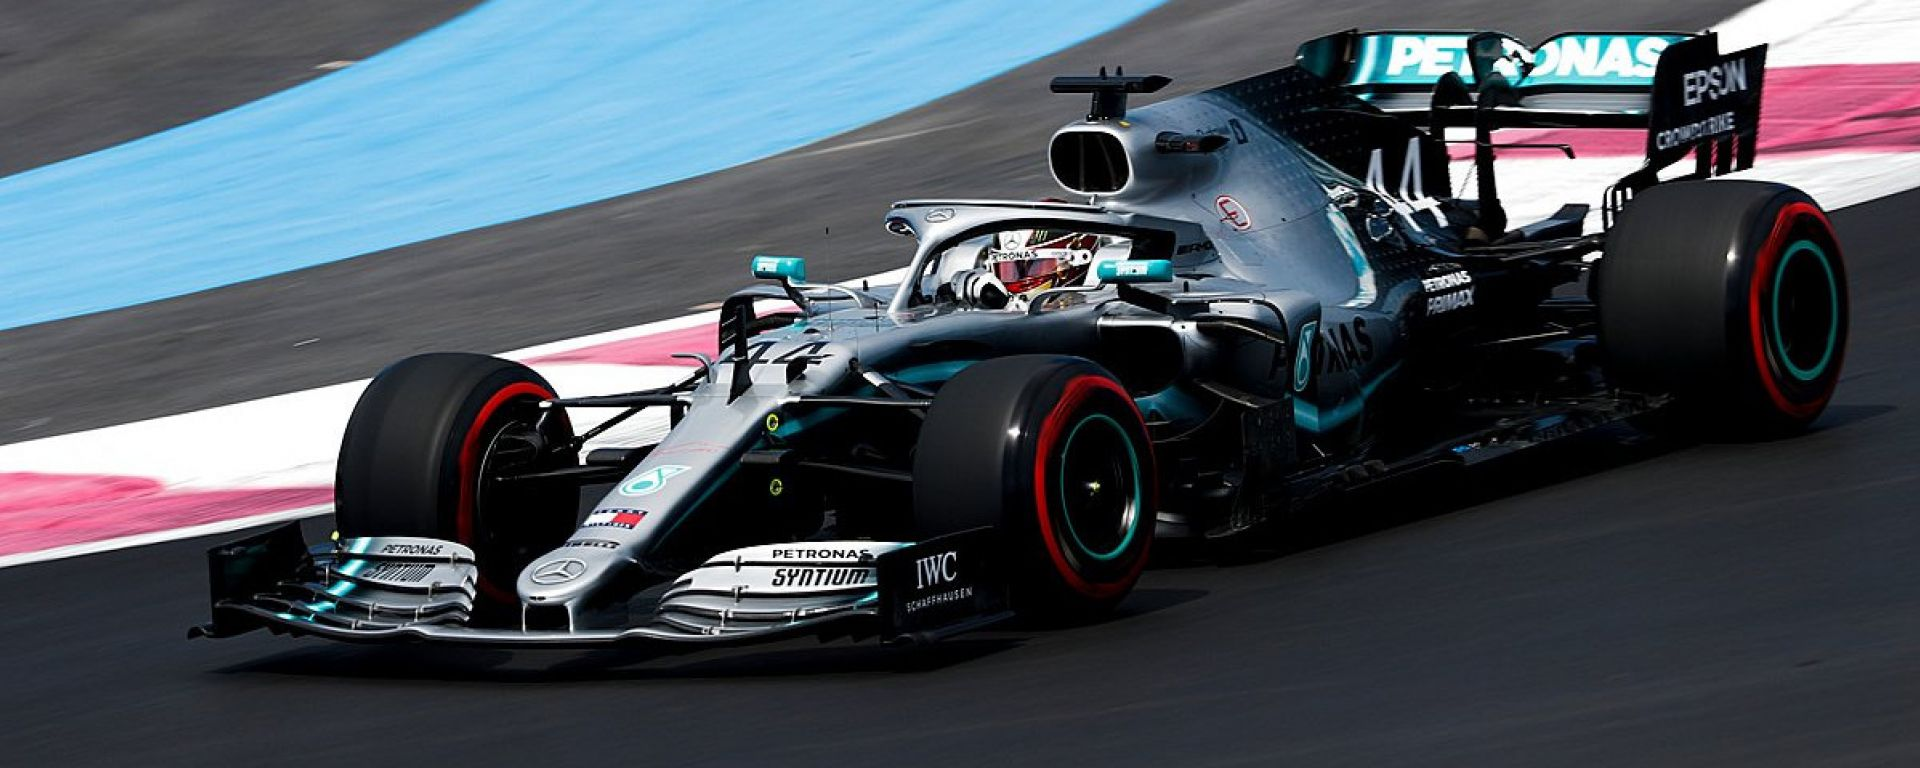 F1 GP Francia 2019 – PL1: Mercedes davanti, problemi per Vettel